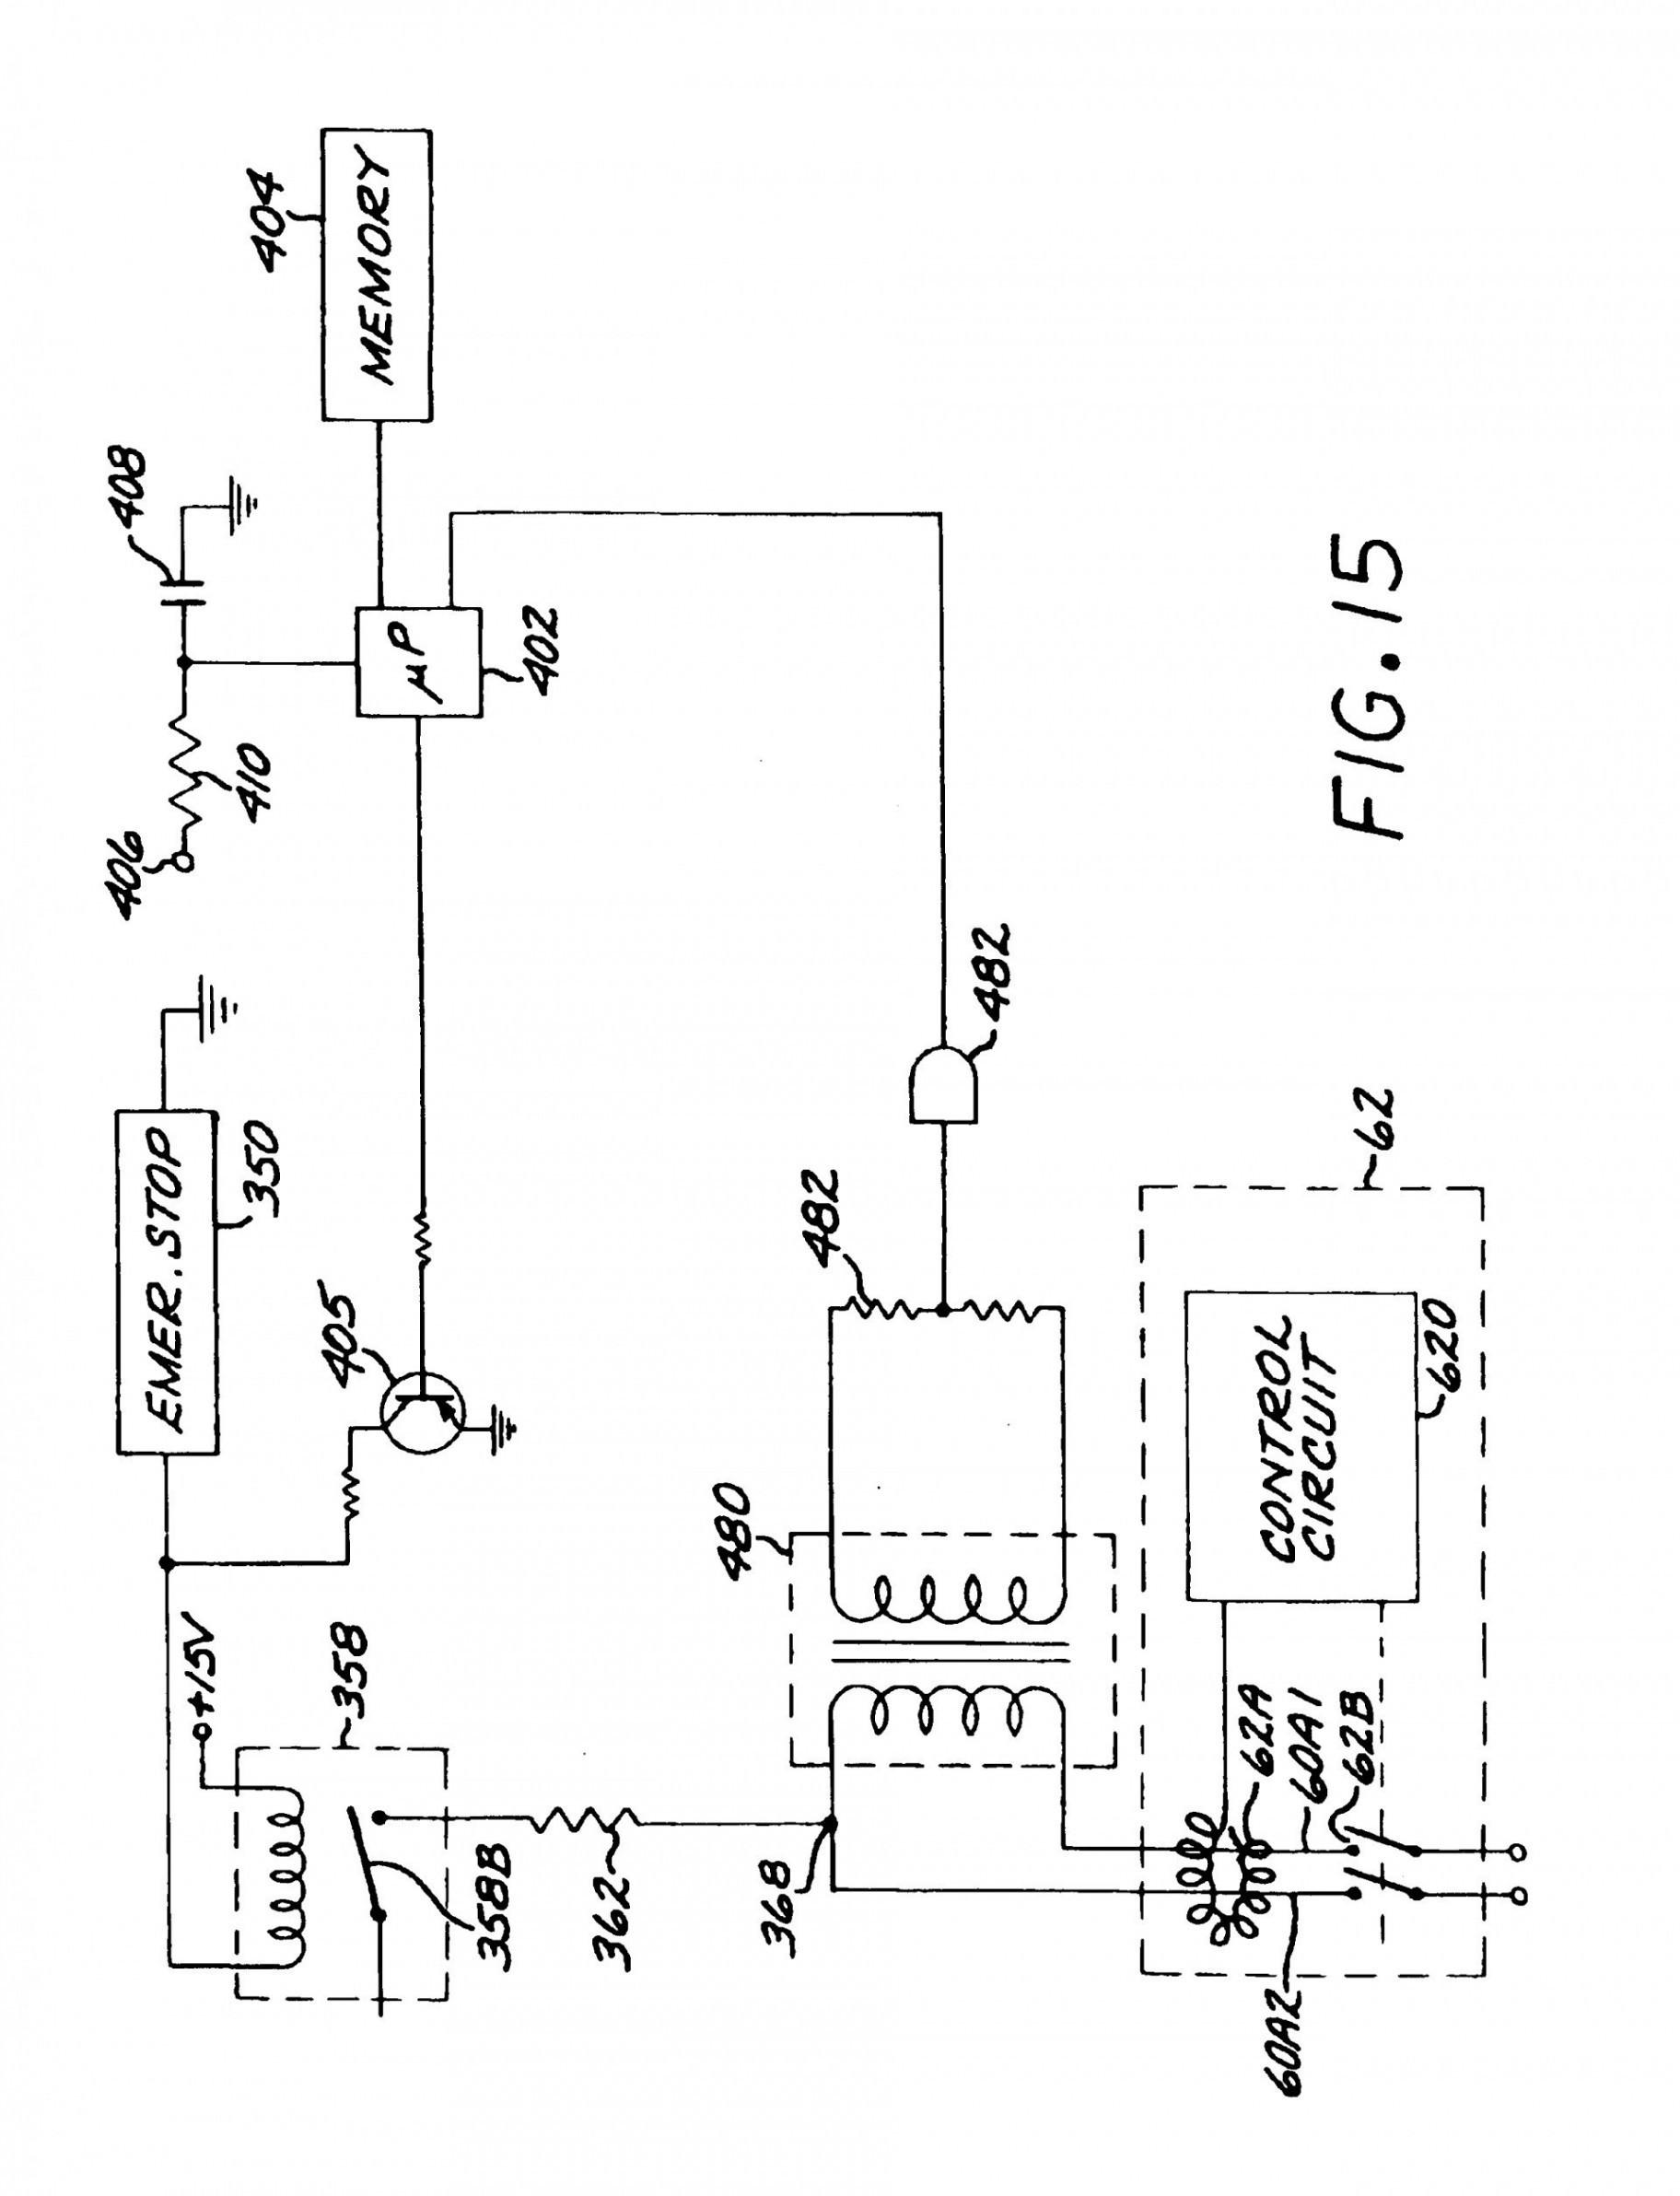 Wiring Diagram Ao Smith Pool Pump